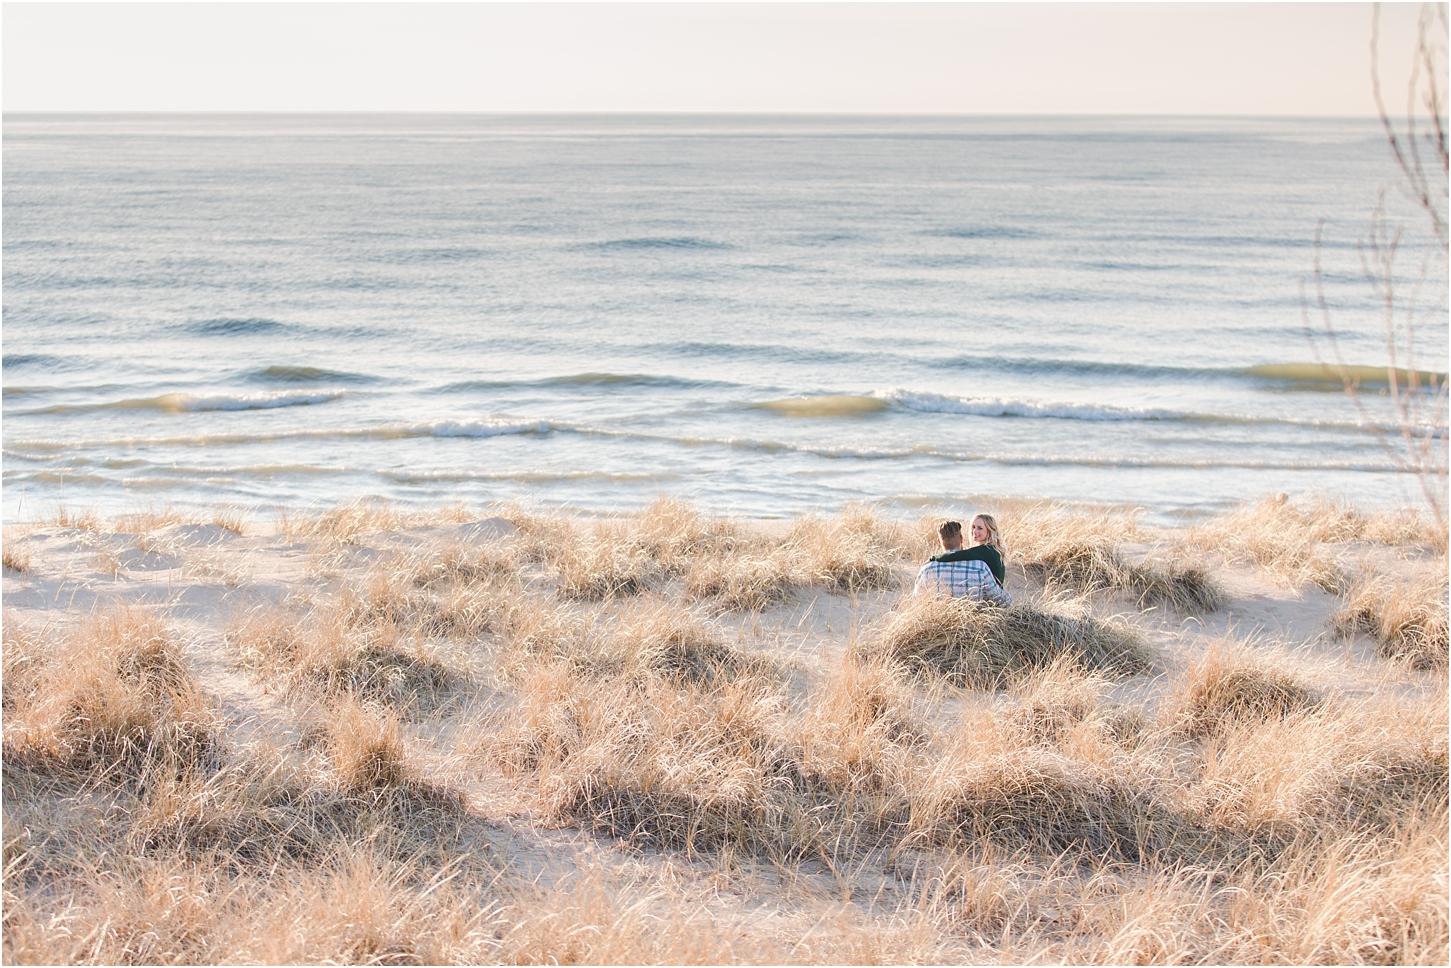 romantic-sunset-beach-engagement-photos-at-silver-beach-in-saint-joseph-mi-by-courtney-carolyn-photography_0014.jpg